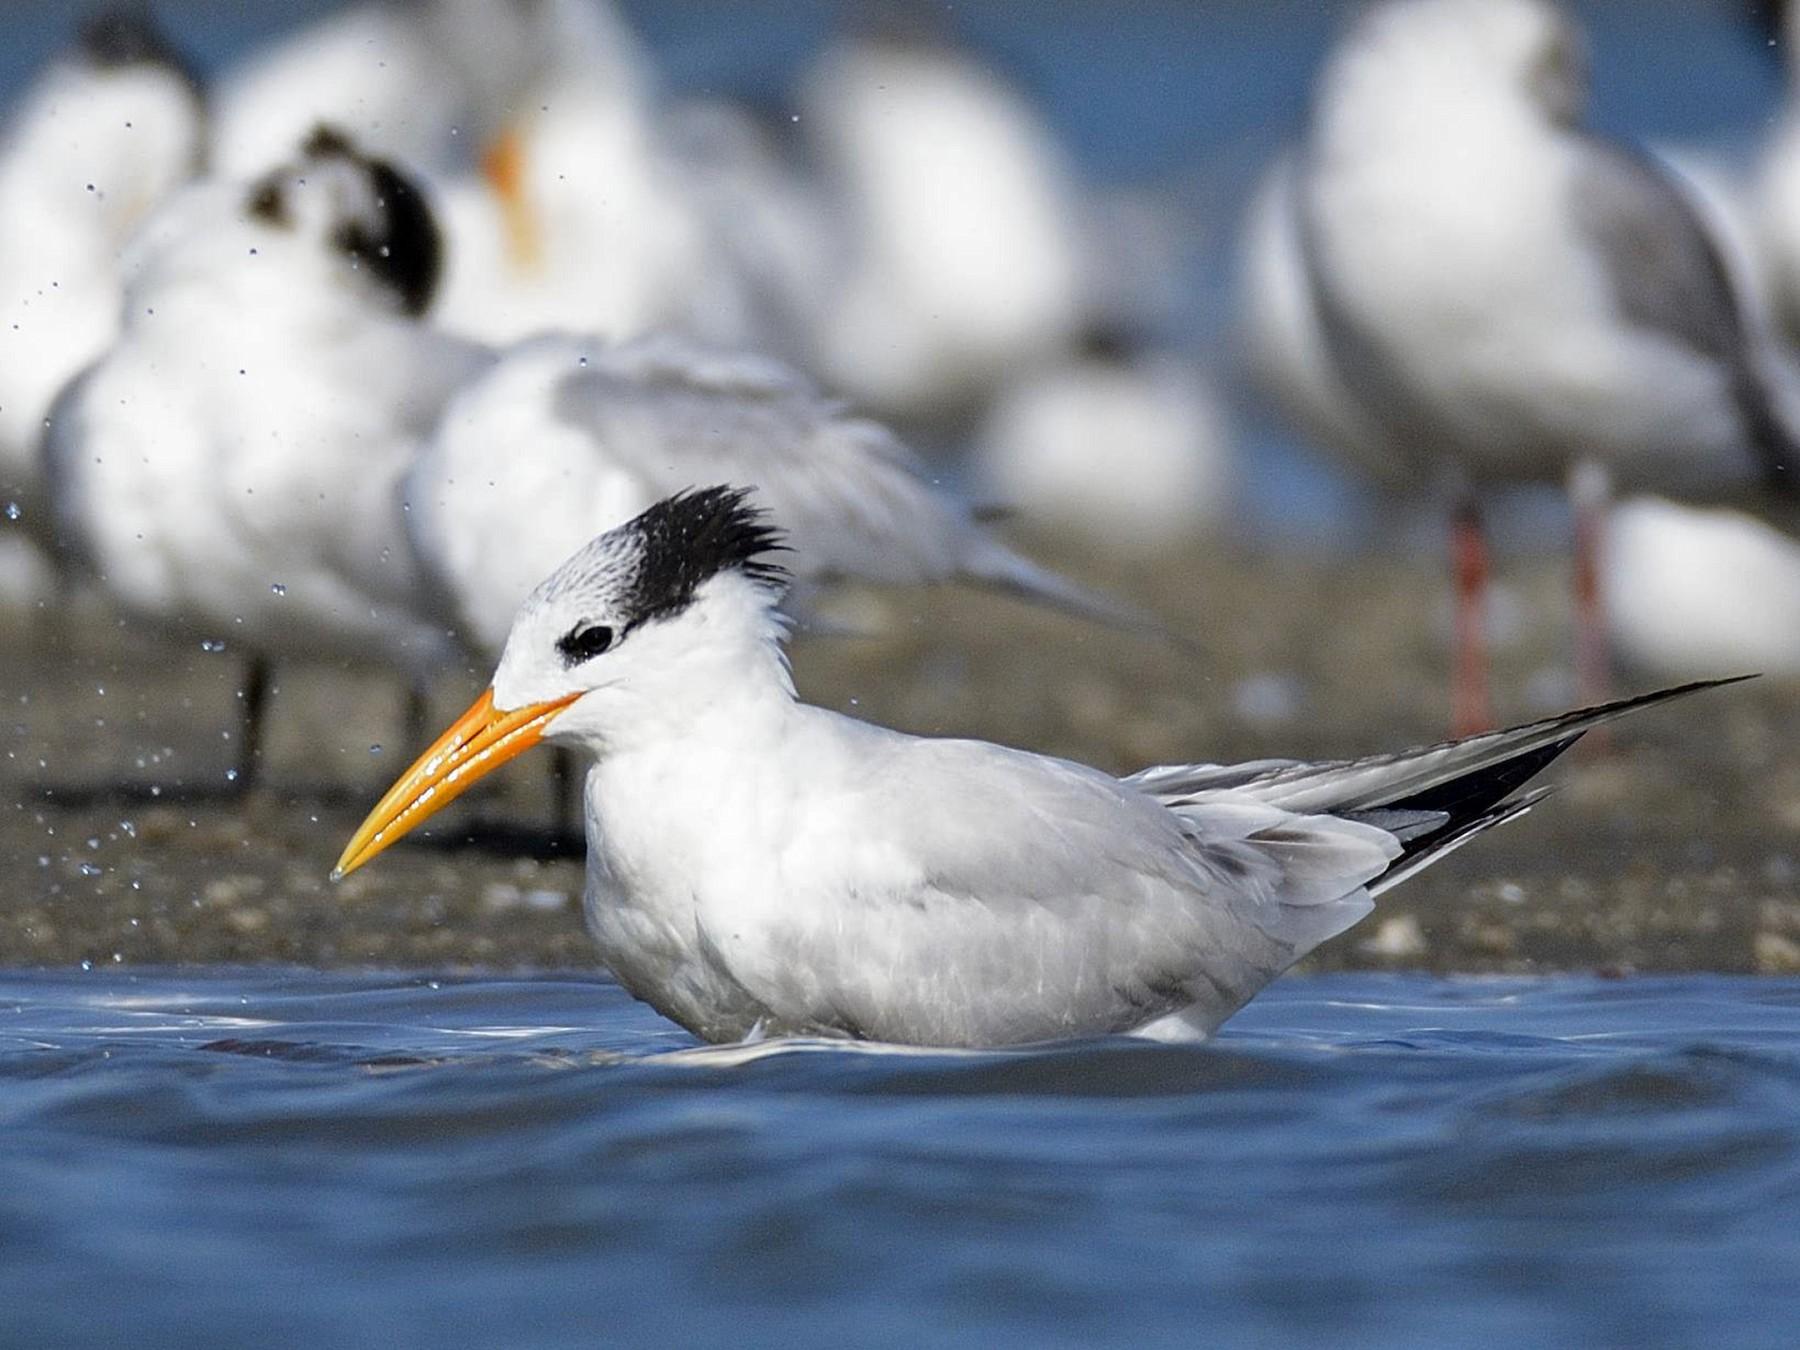 Royal Tern - Eric francois Roualet